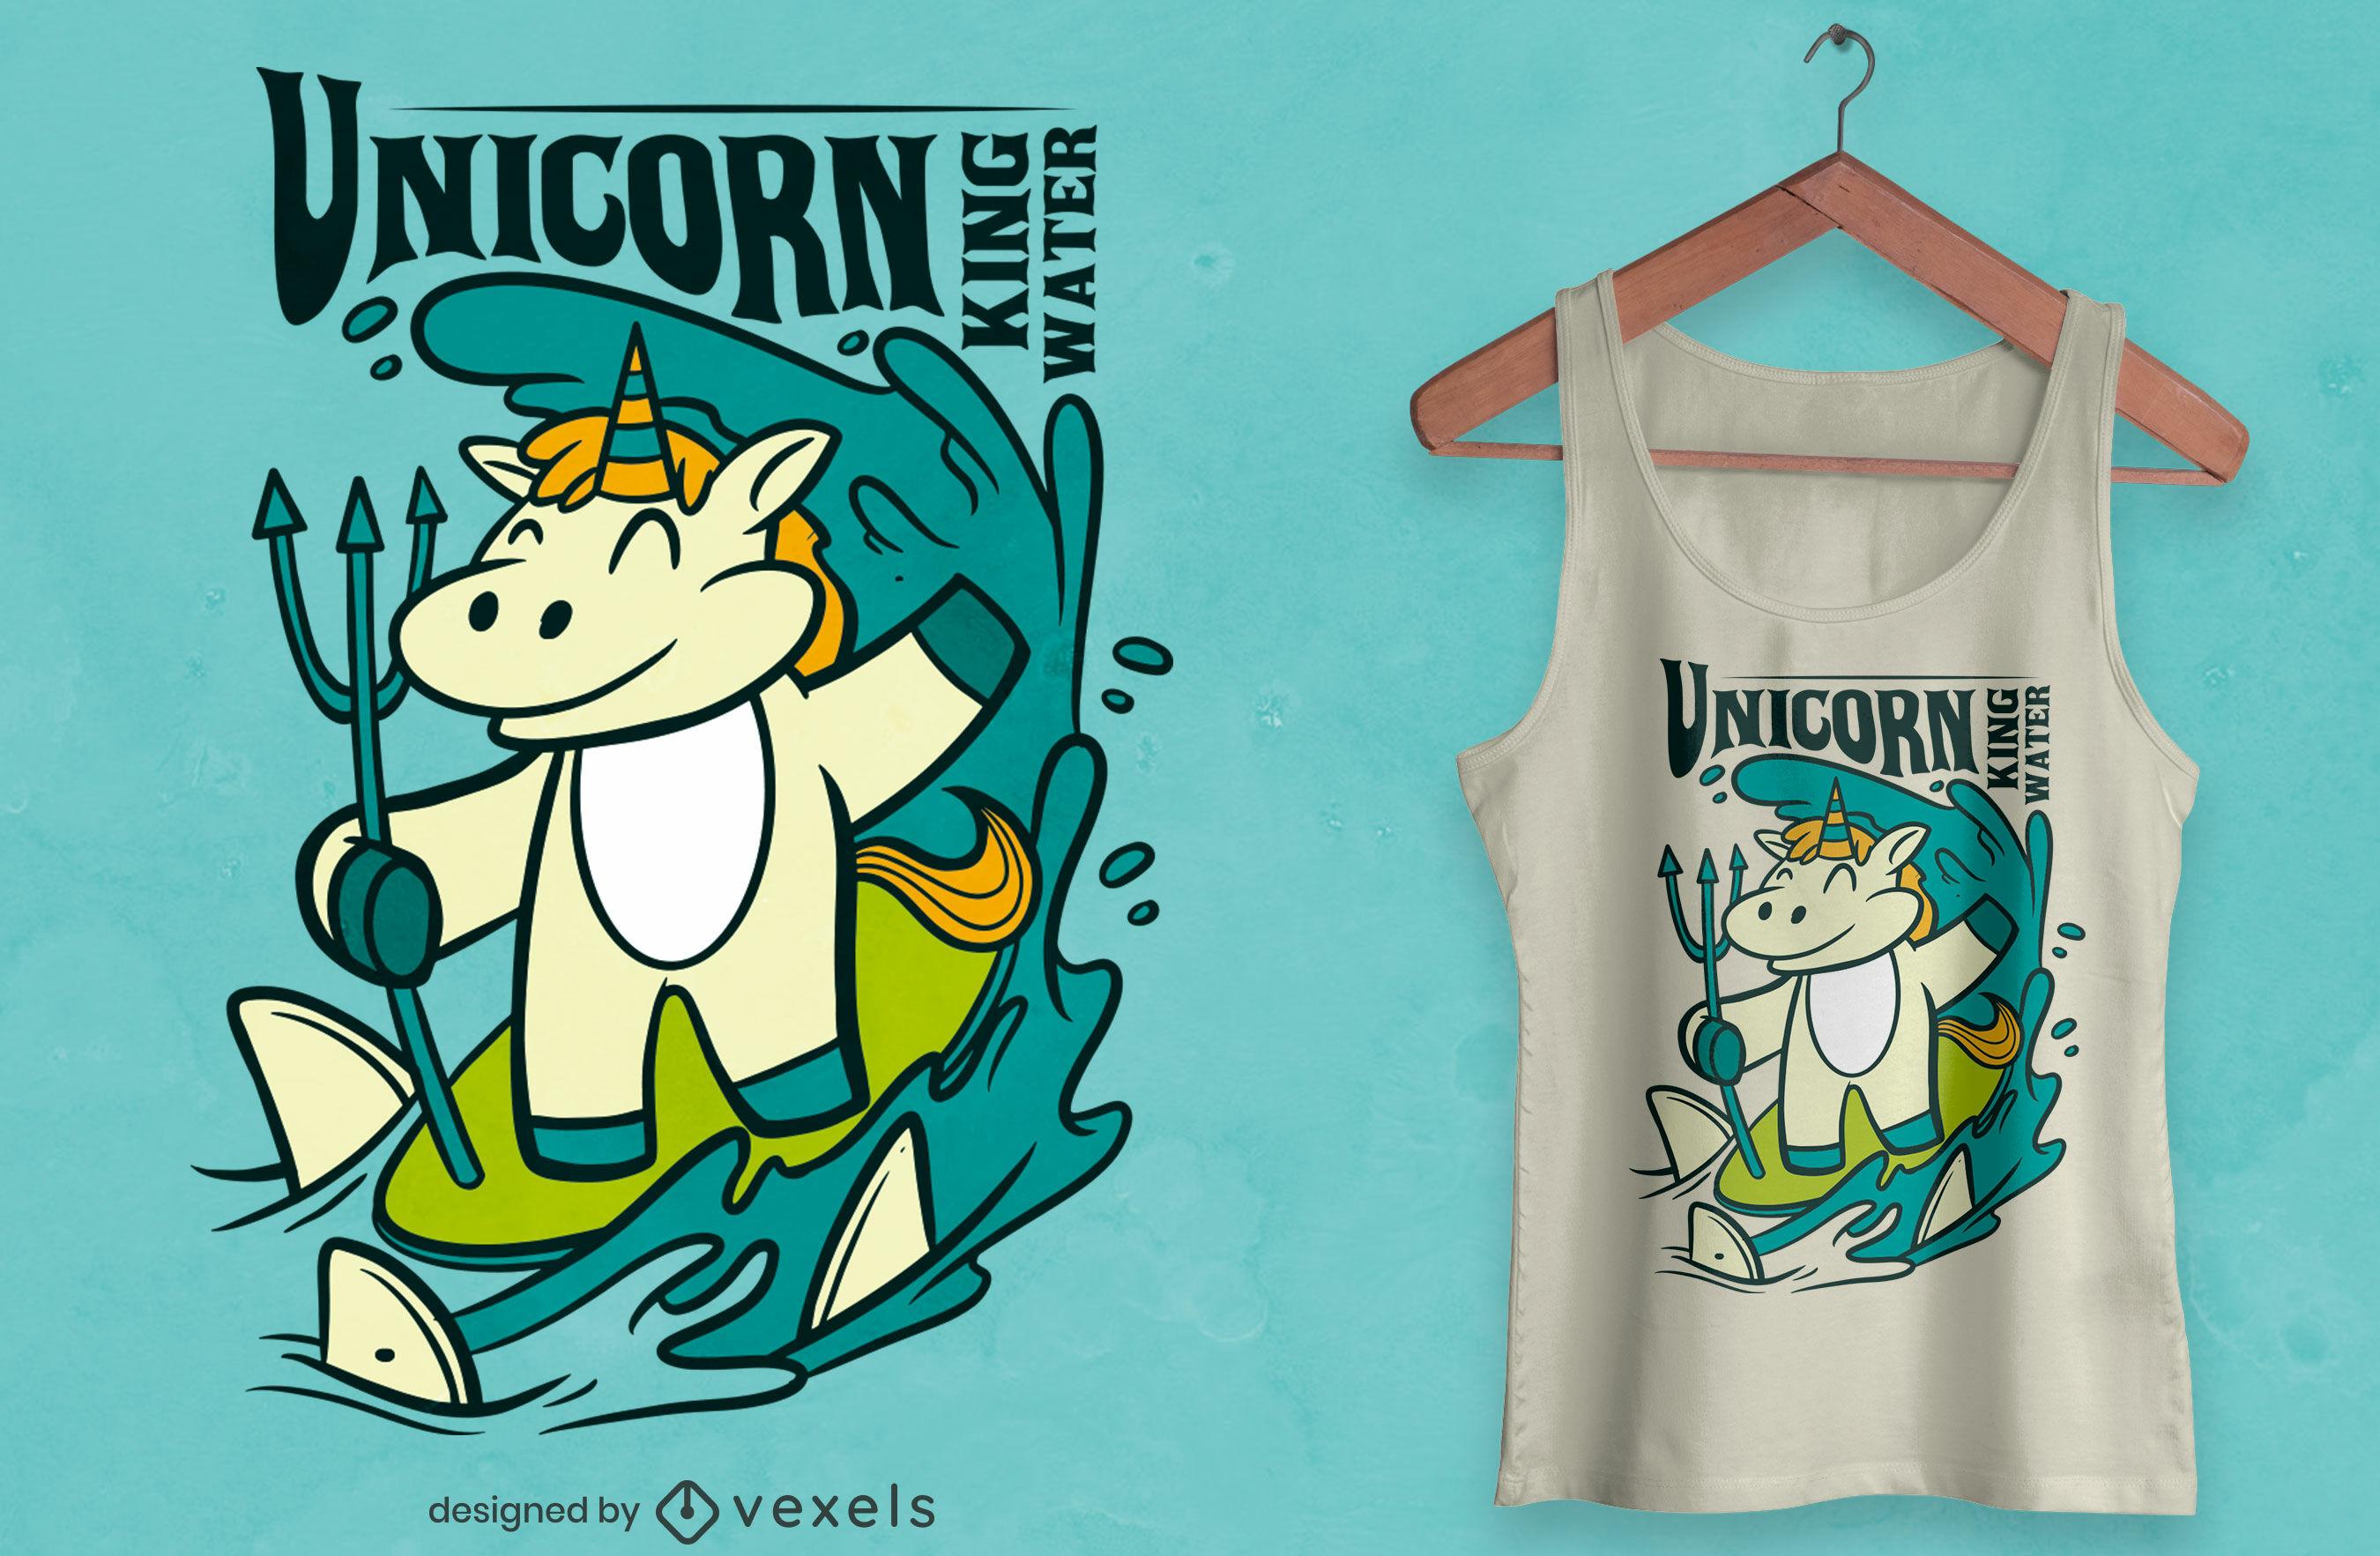 Surfing unicorn cartoon t-shirt design